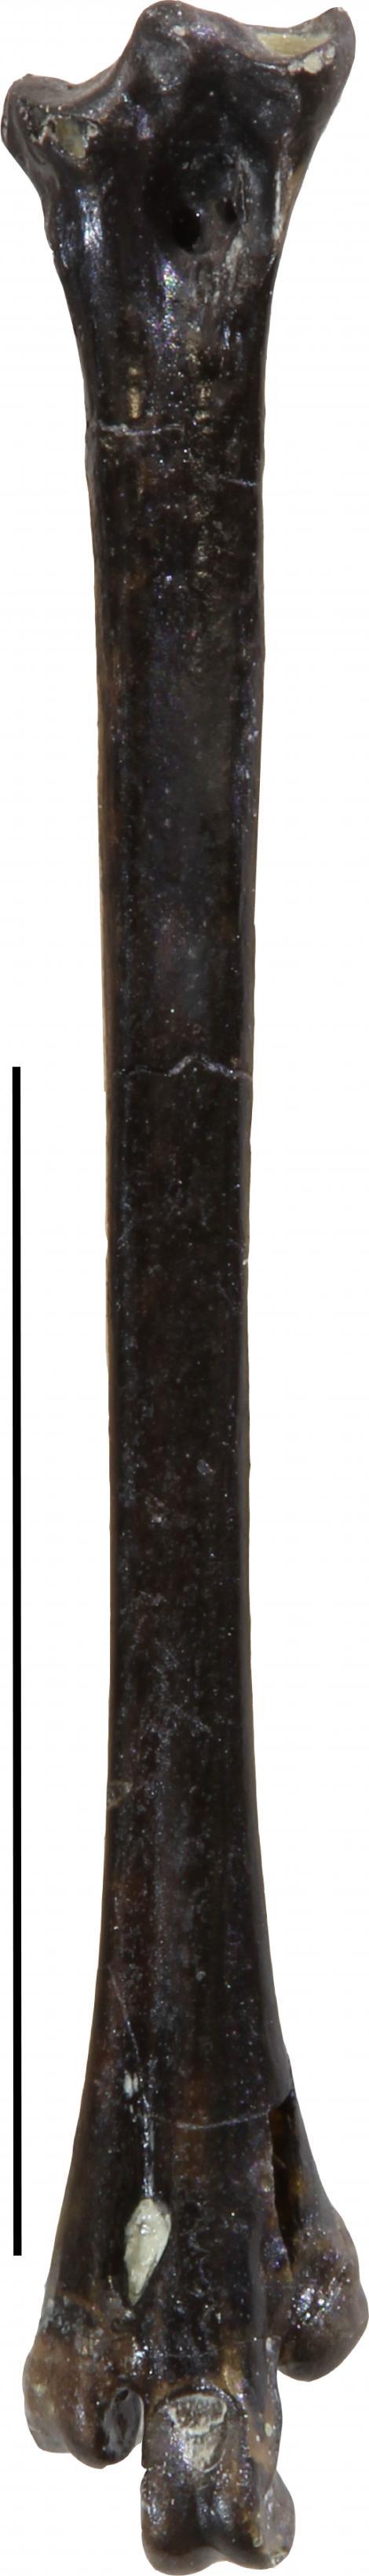 New Zealand lake-wanderer. Holotype right tarsometatarsus (NMNZ S.50806). Scale bar = 10 mm. St Bathans. Image © Vanesa De Pietri by Vanesa De Pietri